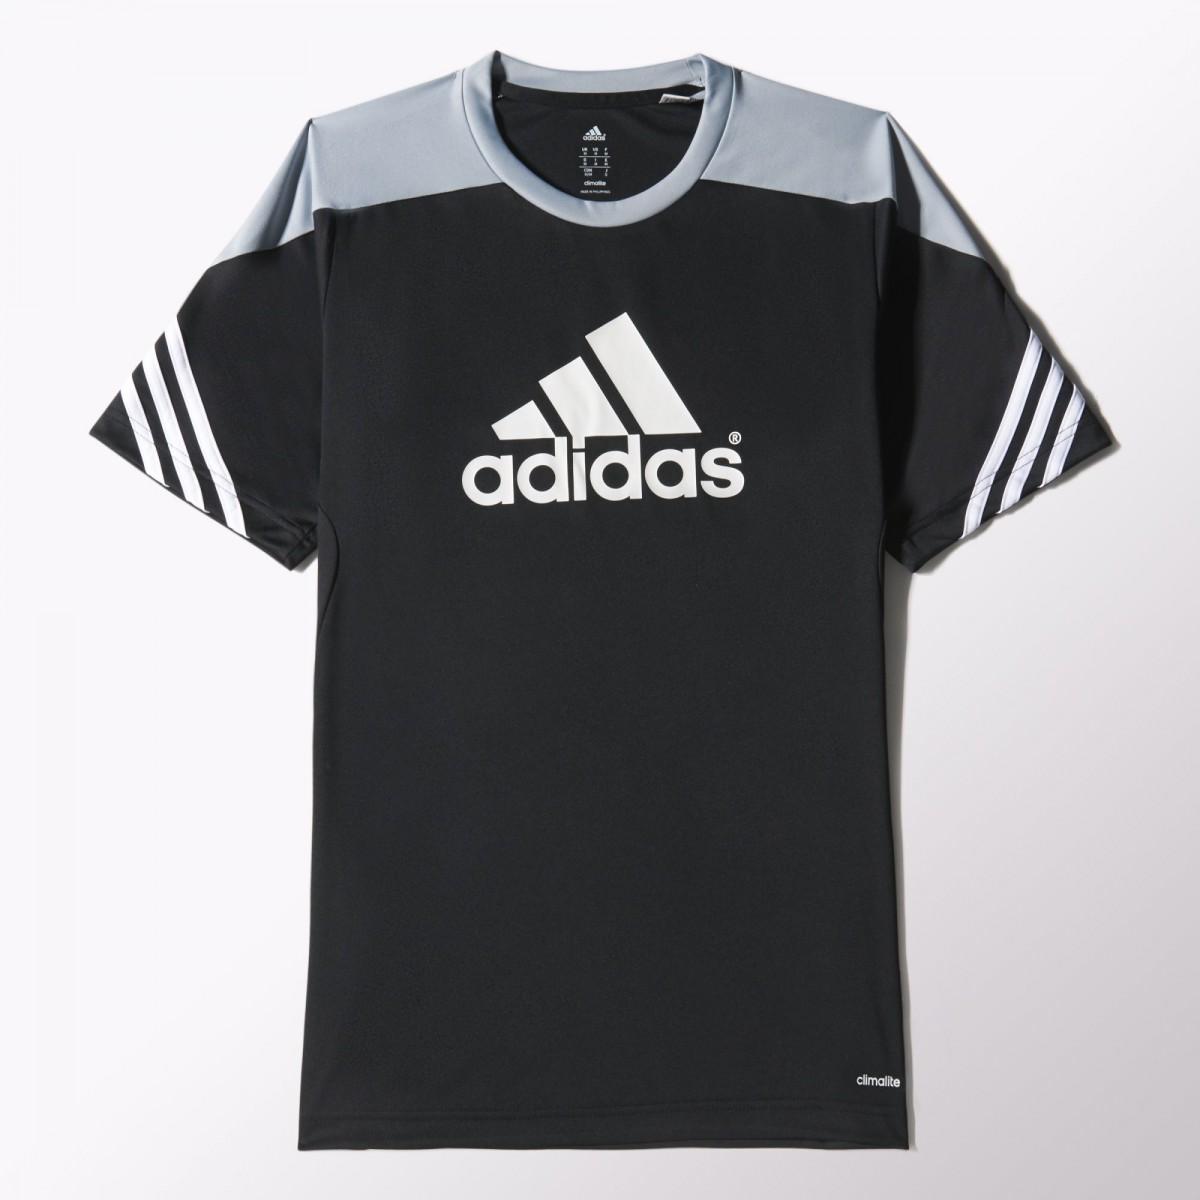 c2a0909bc83 Camiseta Adidas Treino Sere 14 F49700 - Preto - Botas Online ...